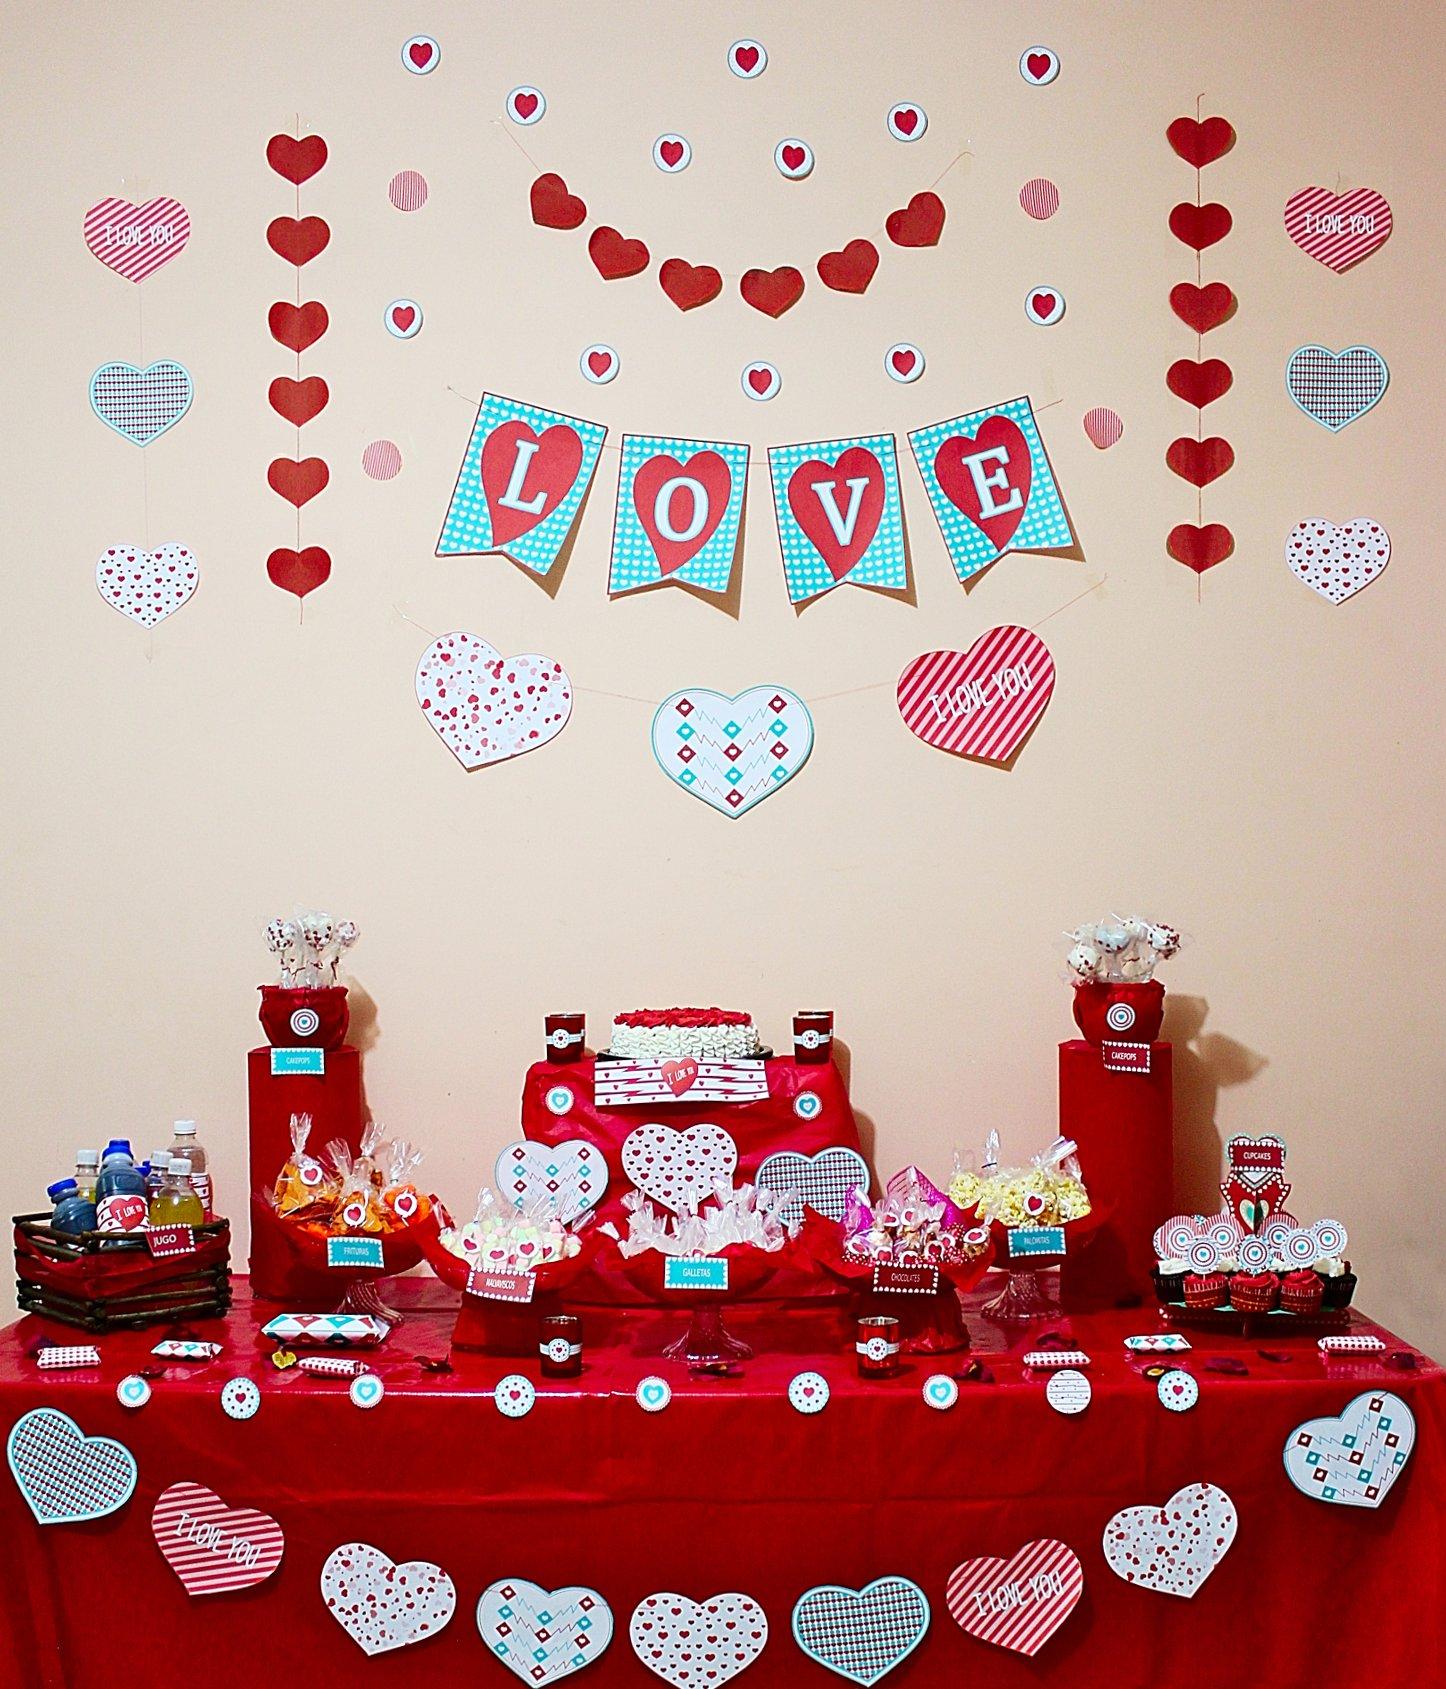 Set de Figuras Imprimibles para el Día de San Valentín - Pasteles D ...